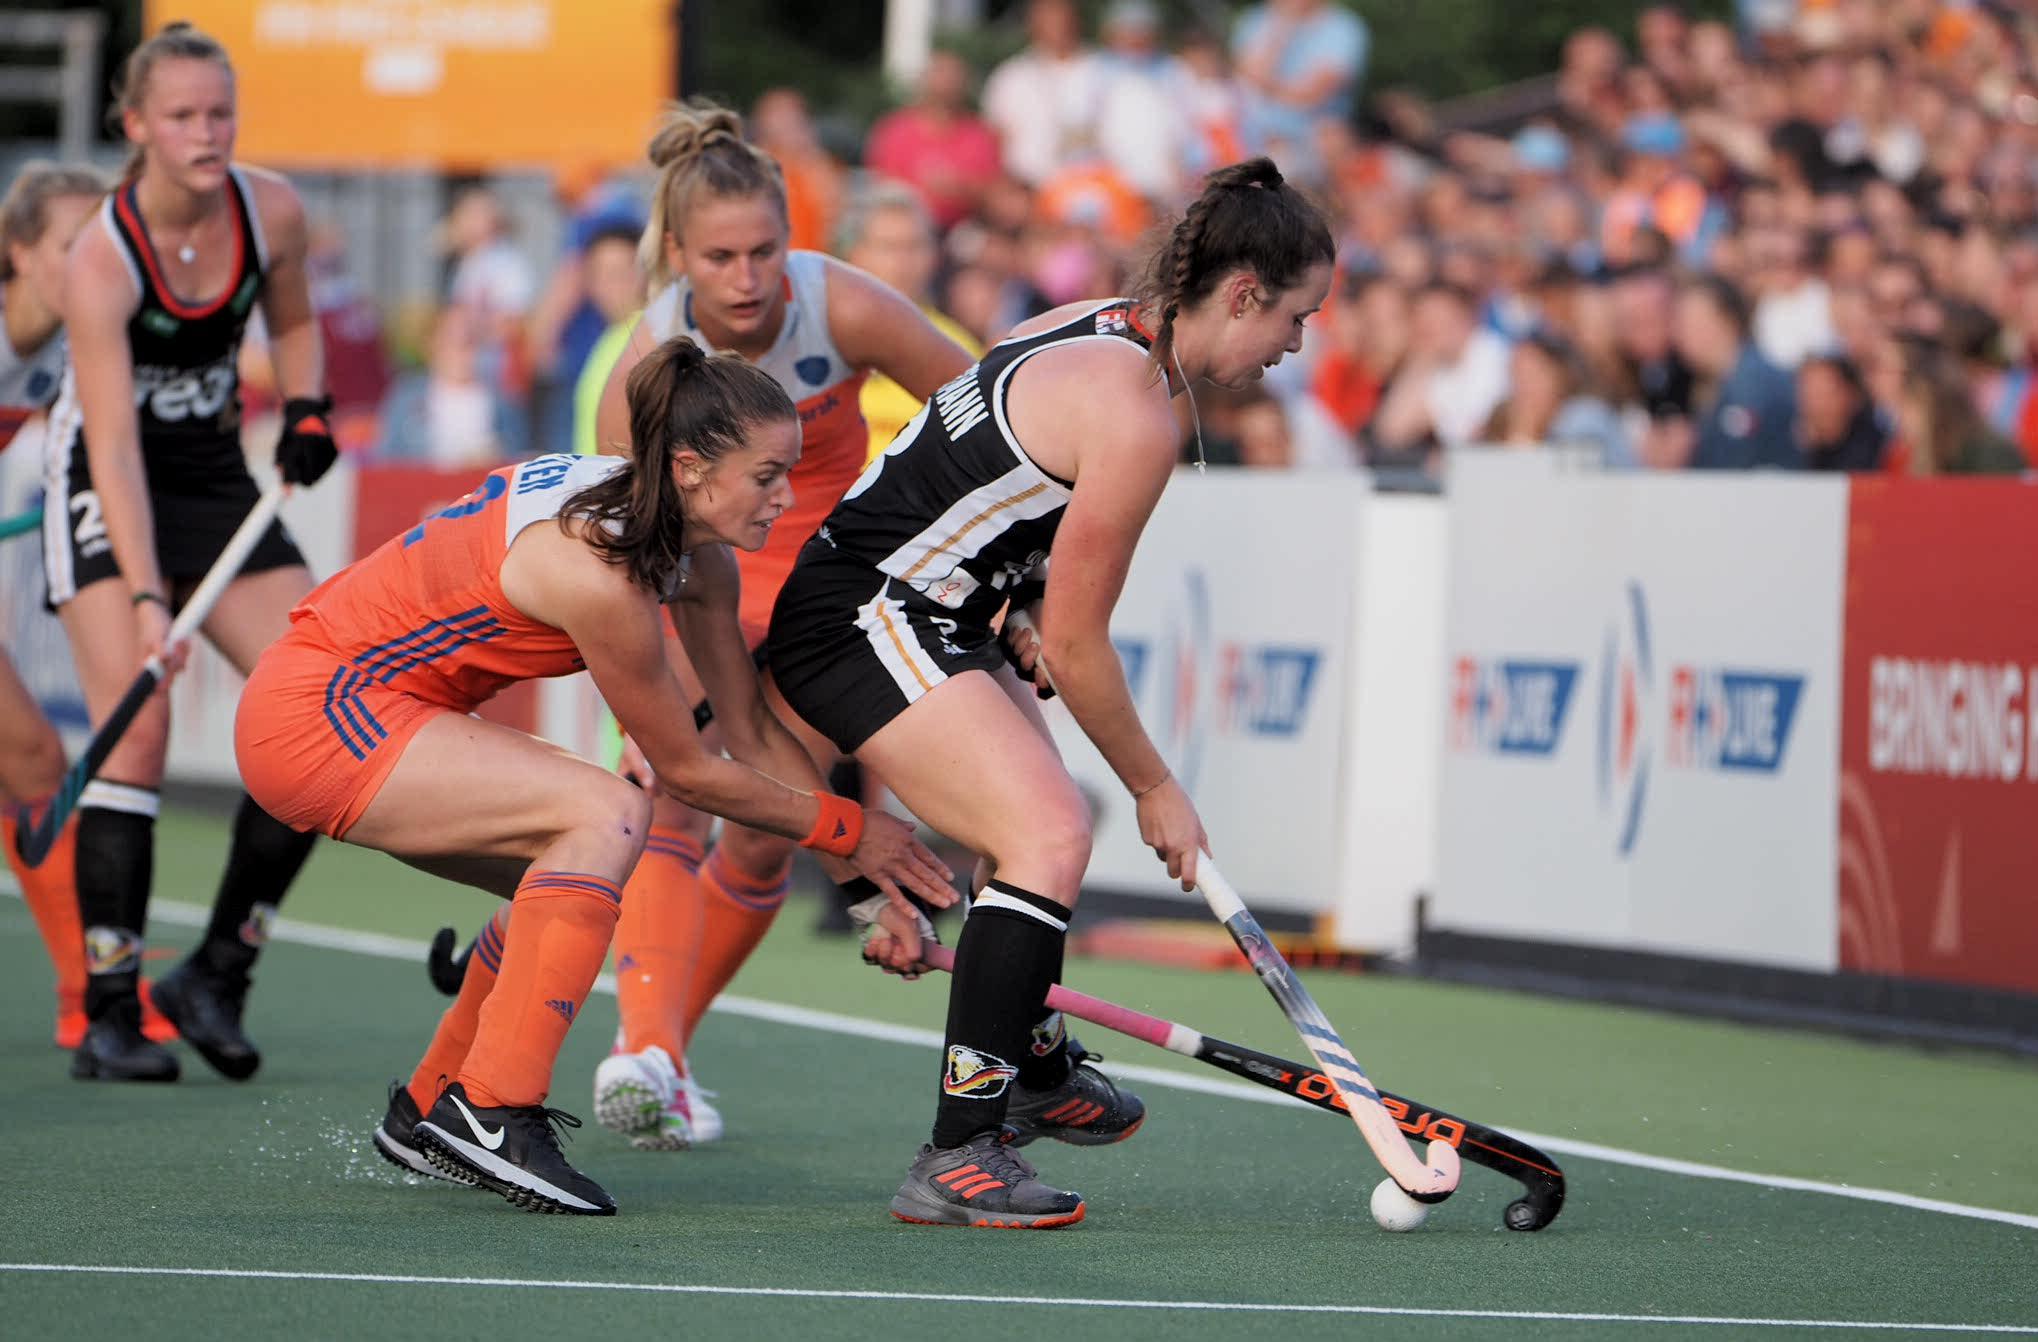 Round-up Pro League Grand Final (D): Oranje in finale na moeizame zege op Duitsland